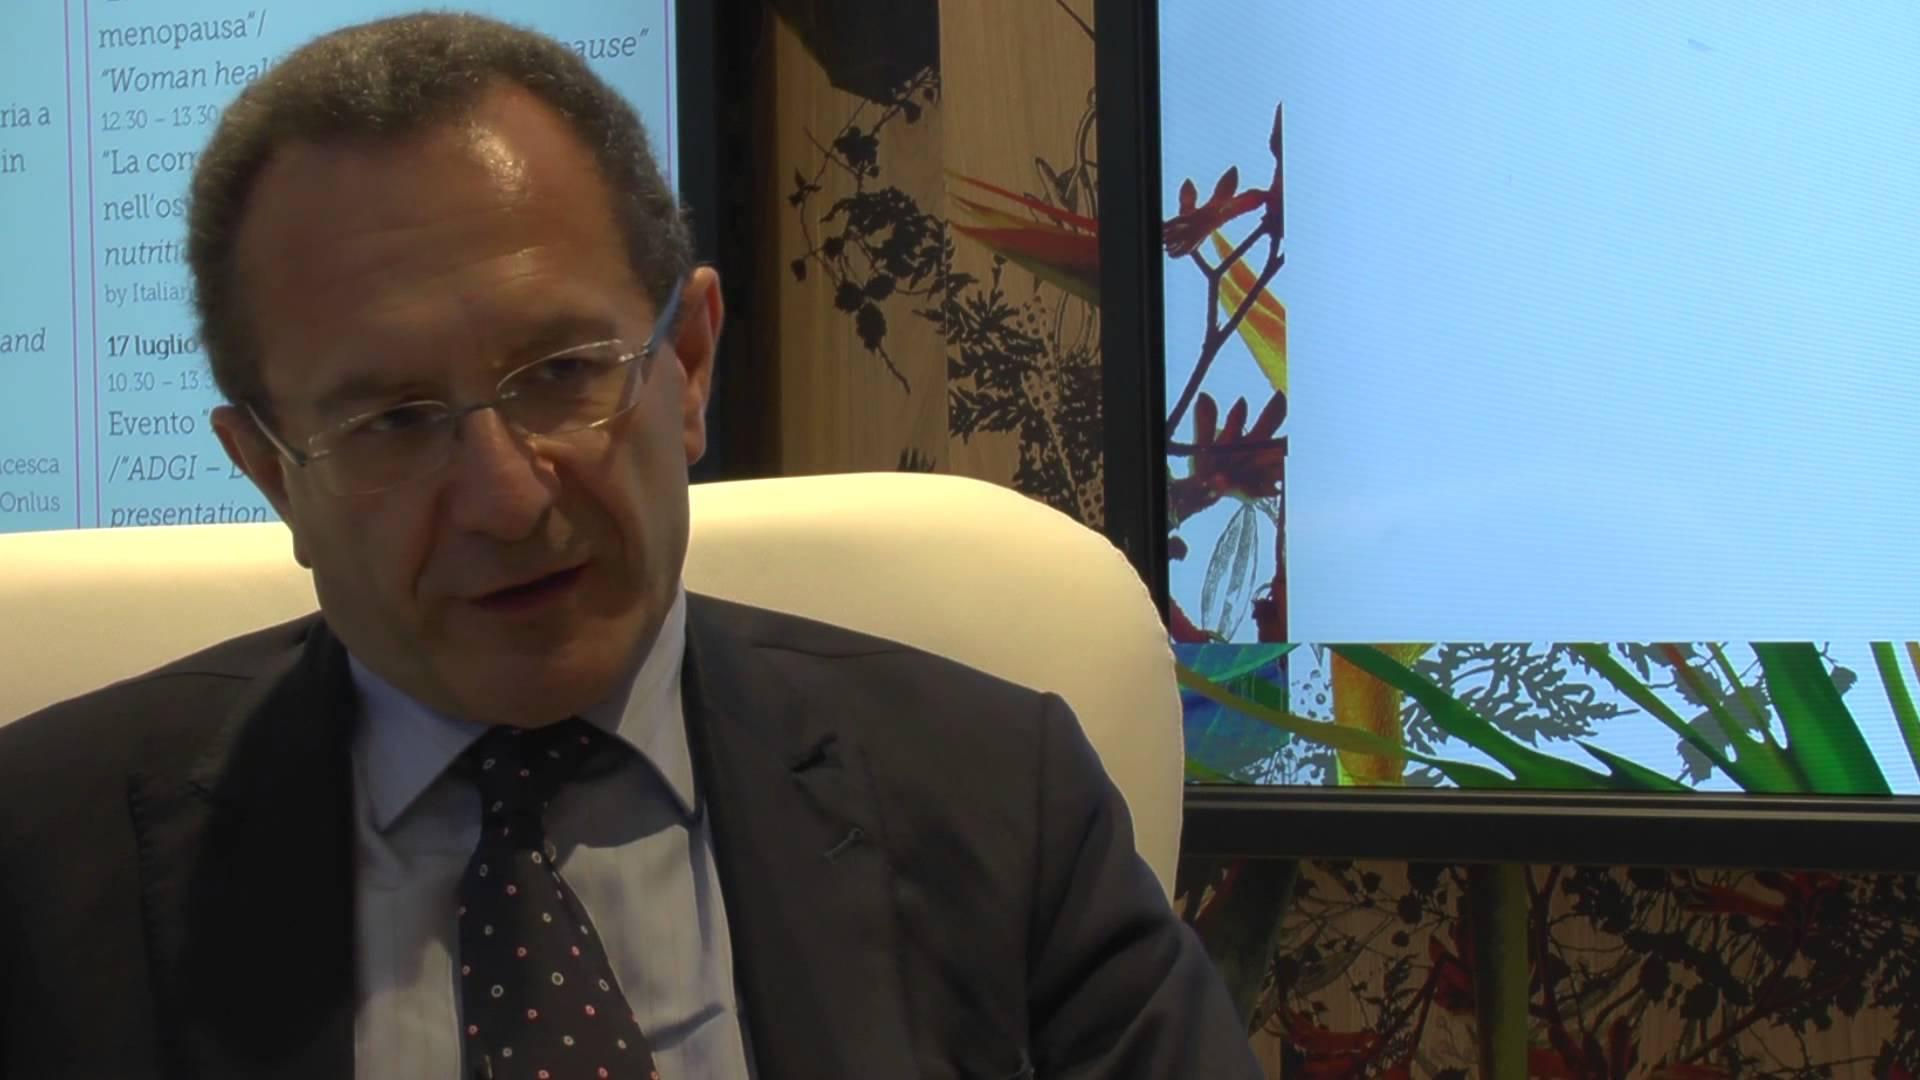 Giuseppe Ruocco sanità digitale digital marketing farmaceutico